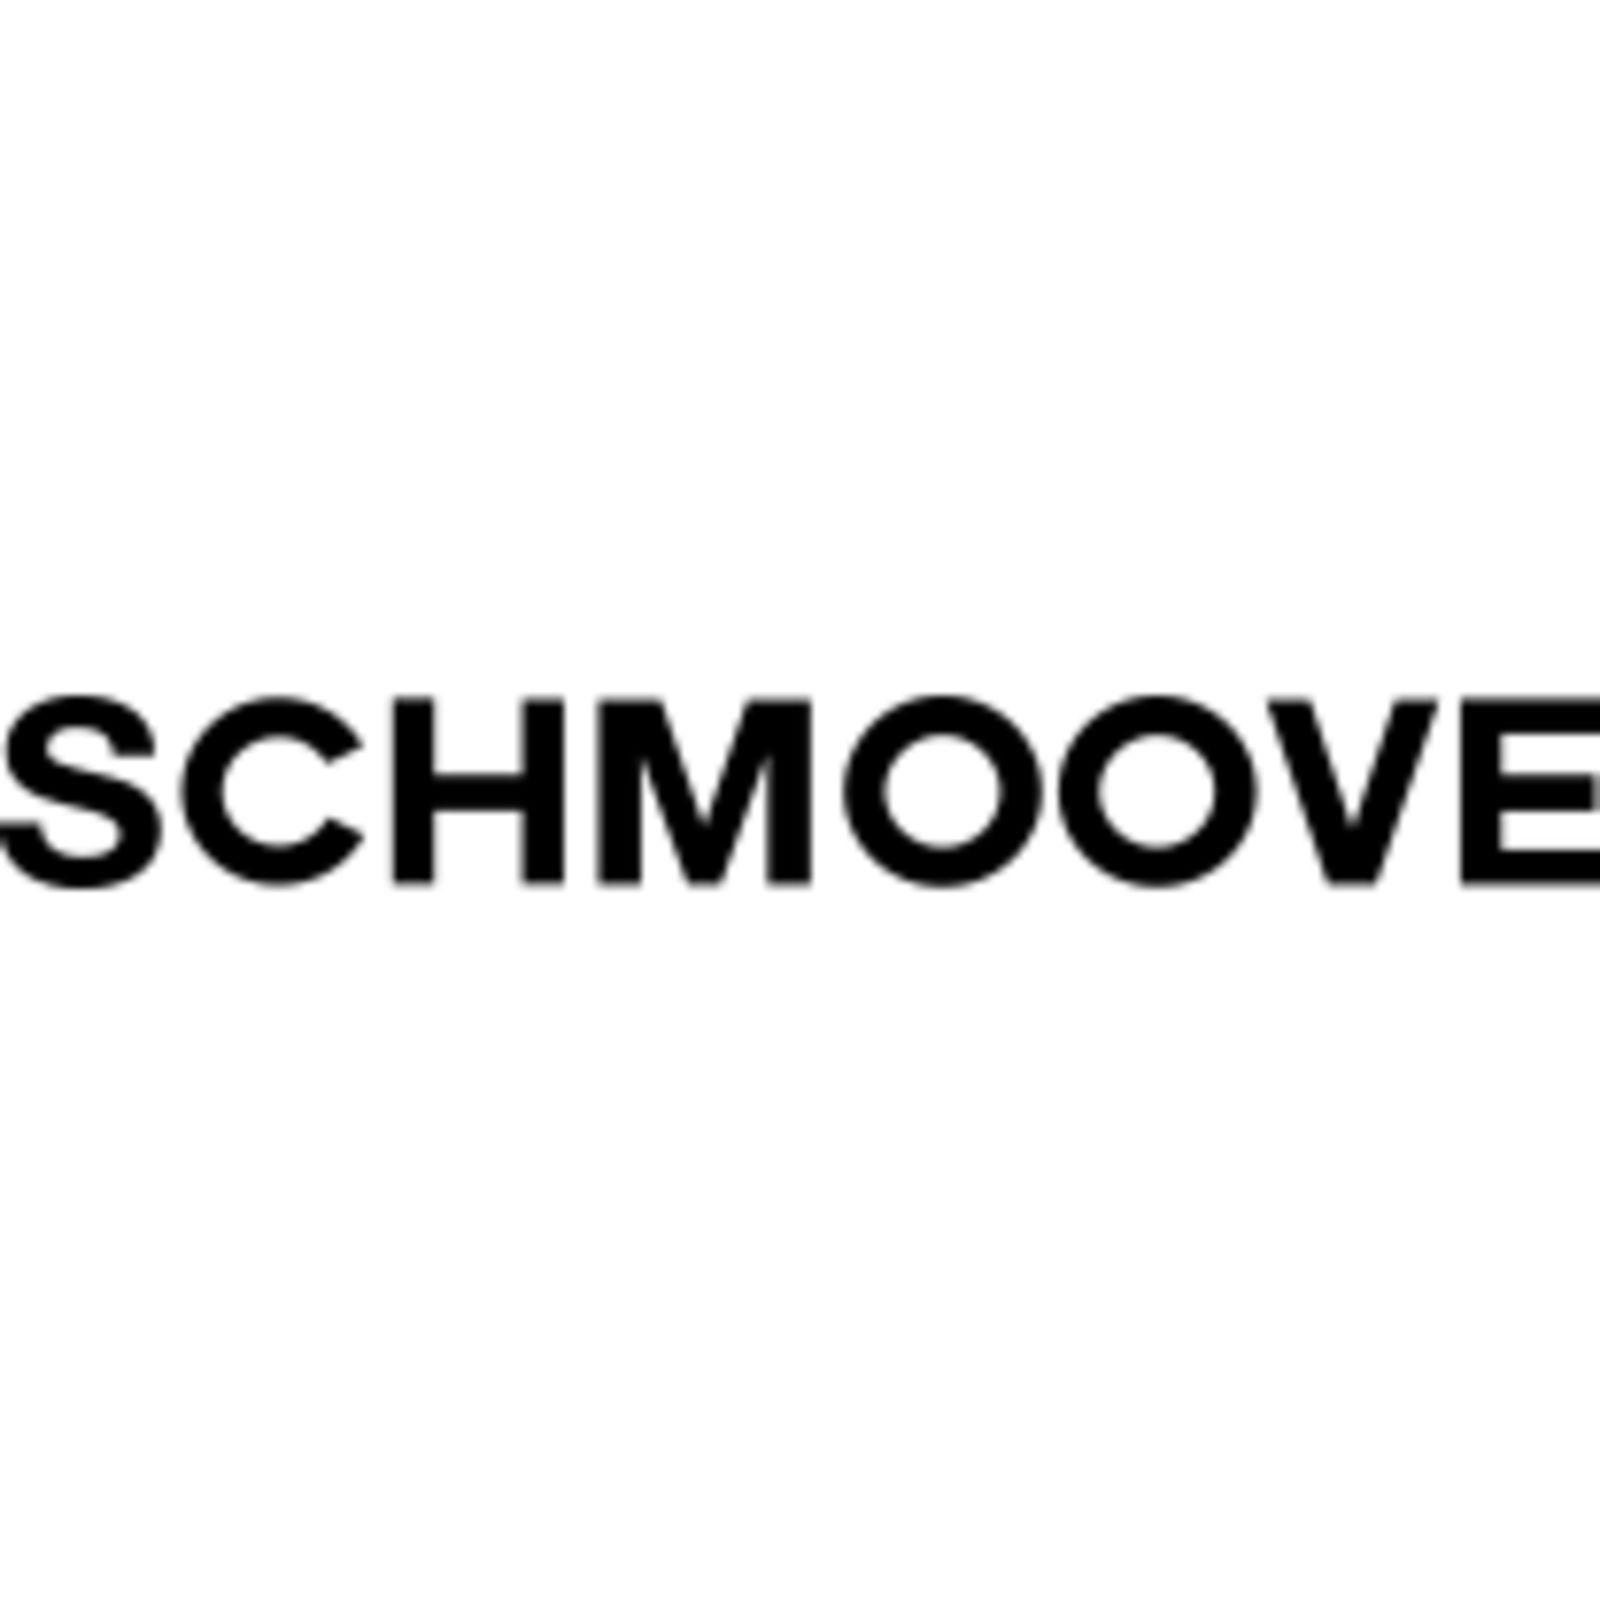 SCHMOOVE